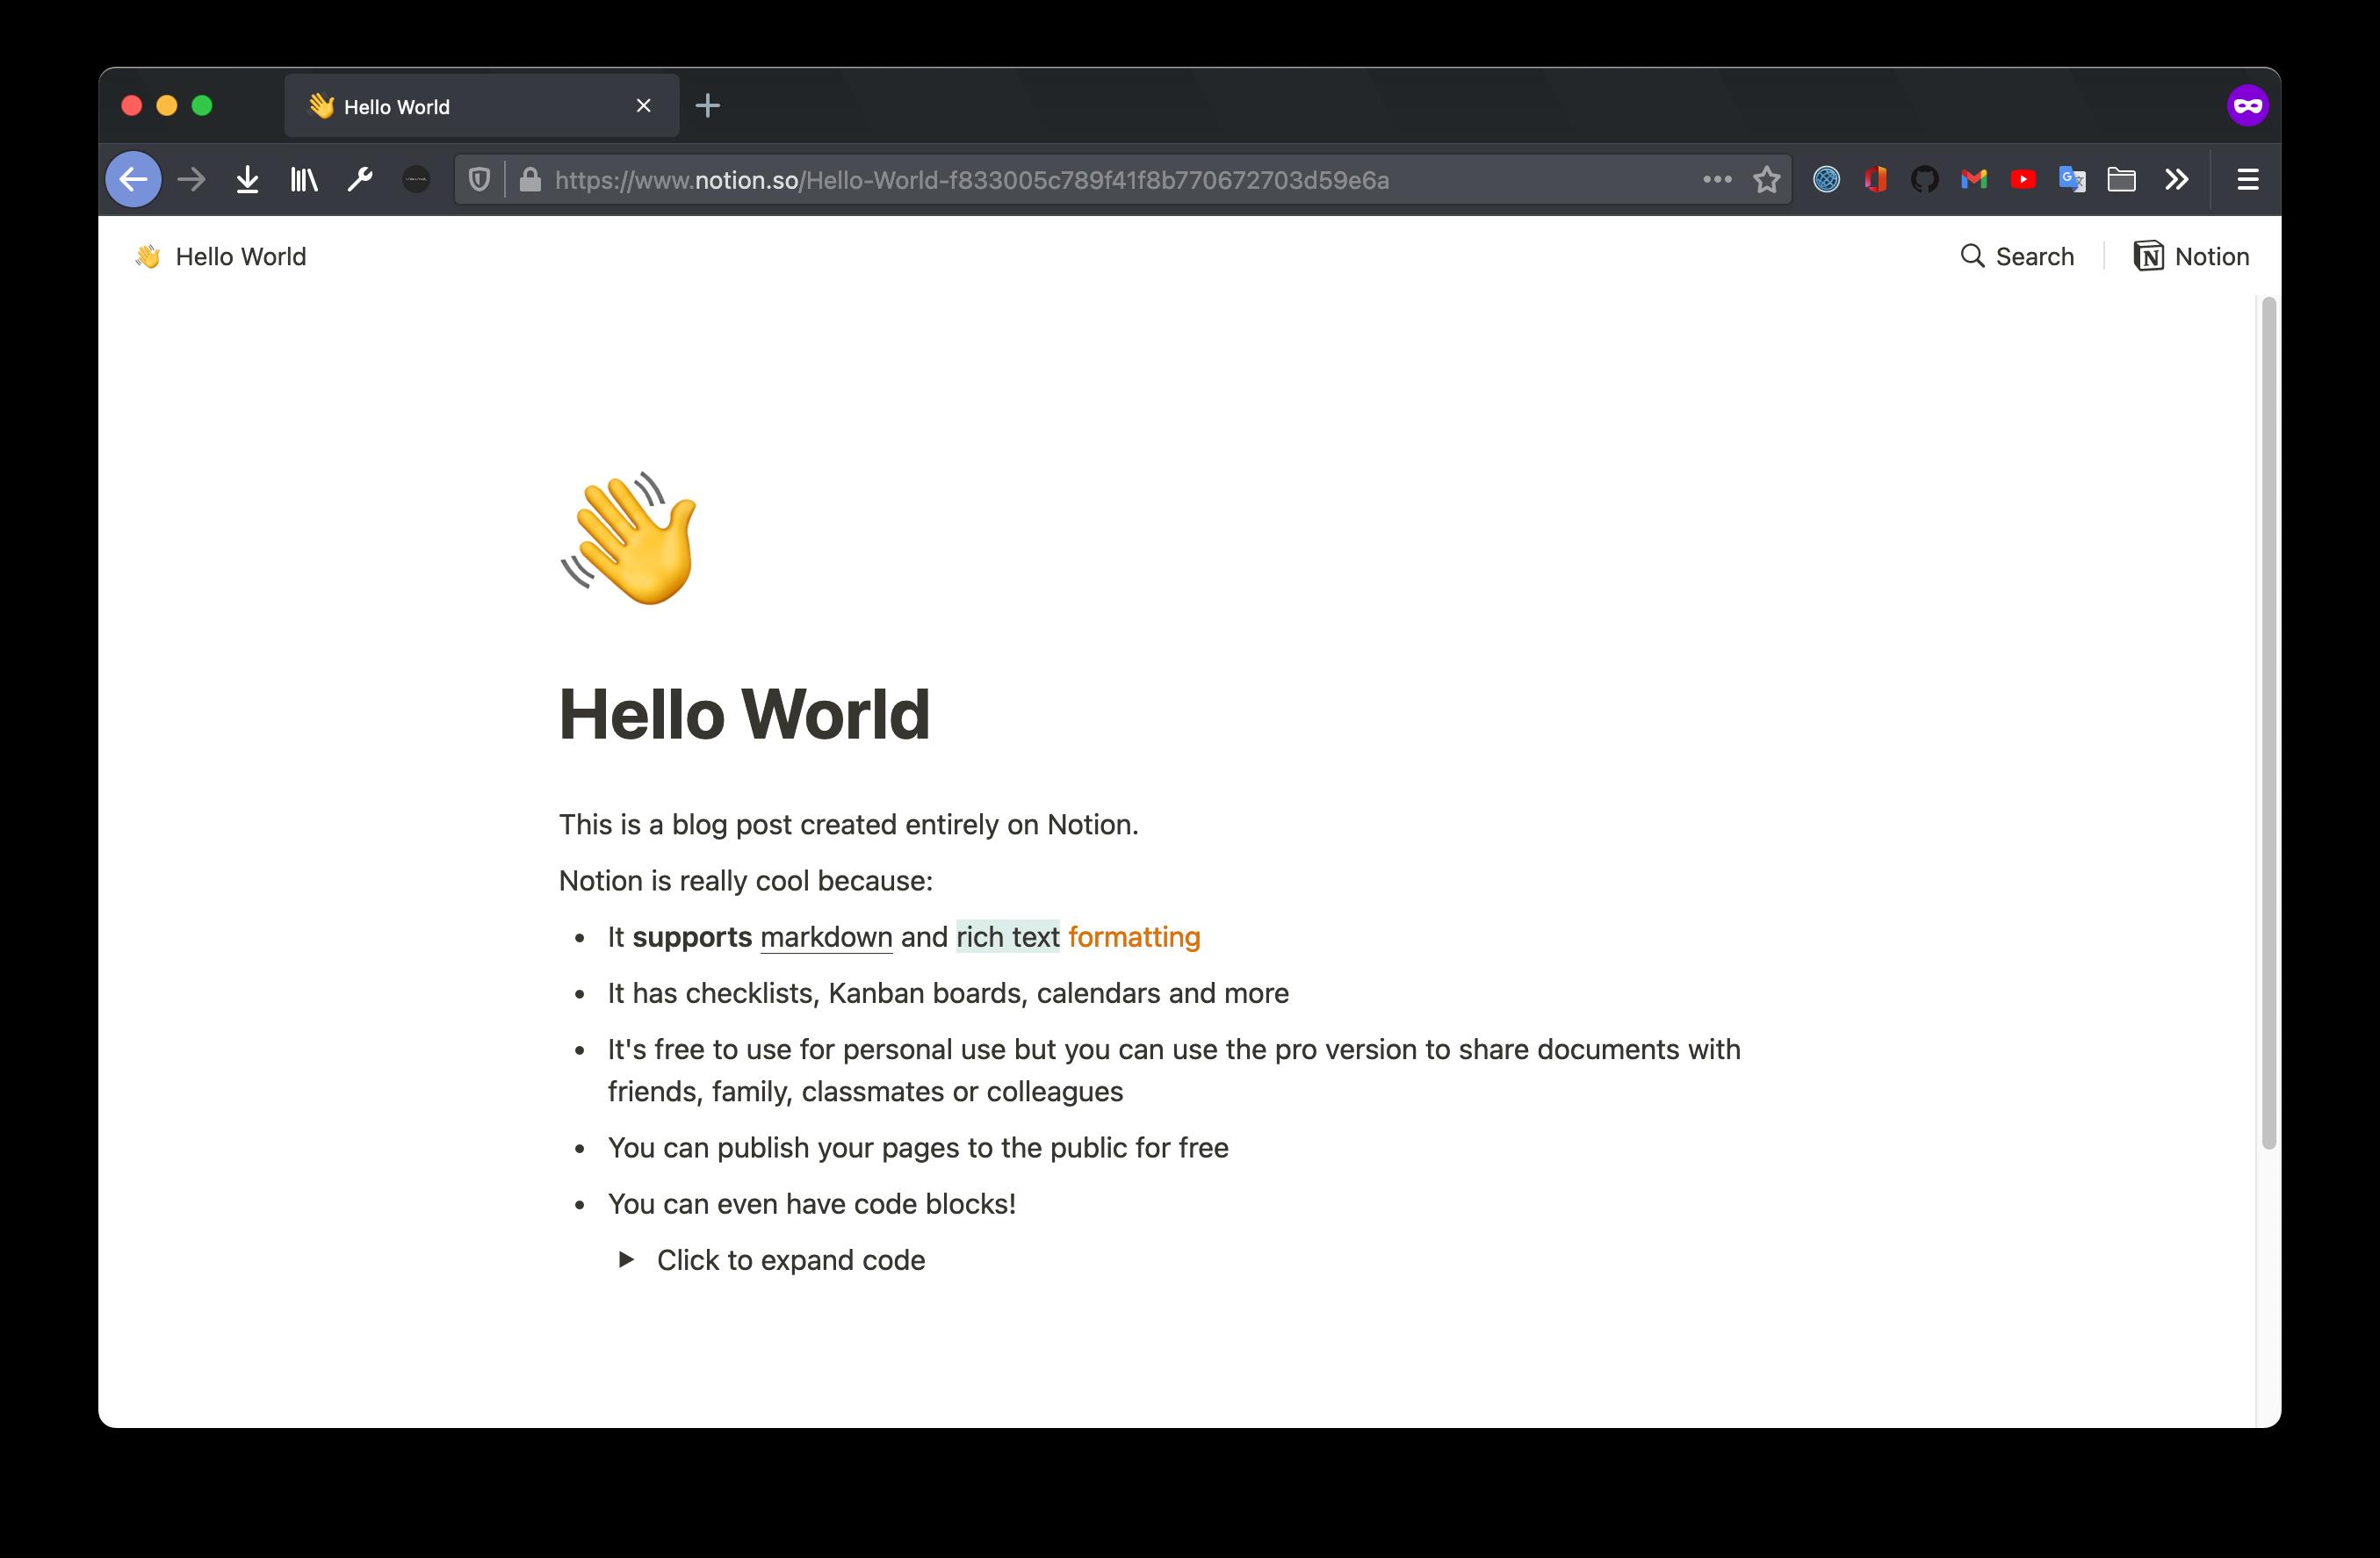 https://cloud-5iswwg3qu-hack-club-bot.vercel.app/0screenshot_2021-04-08_at_14.20.17.png